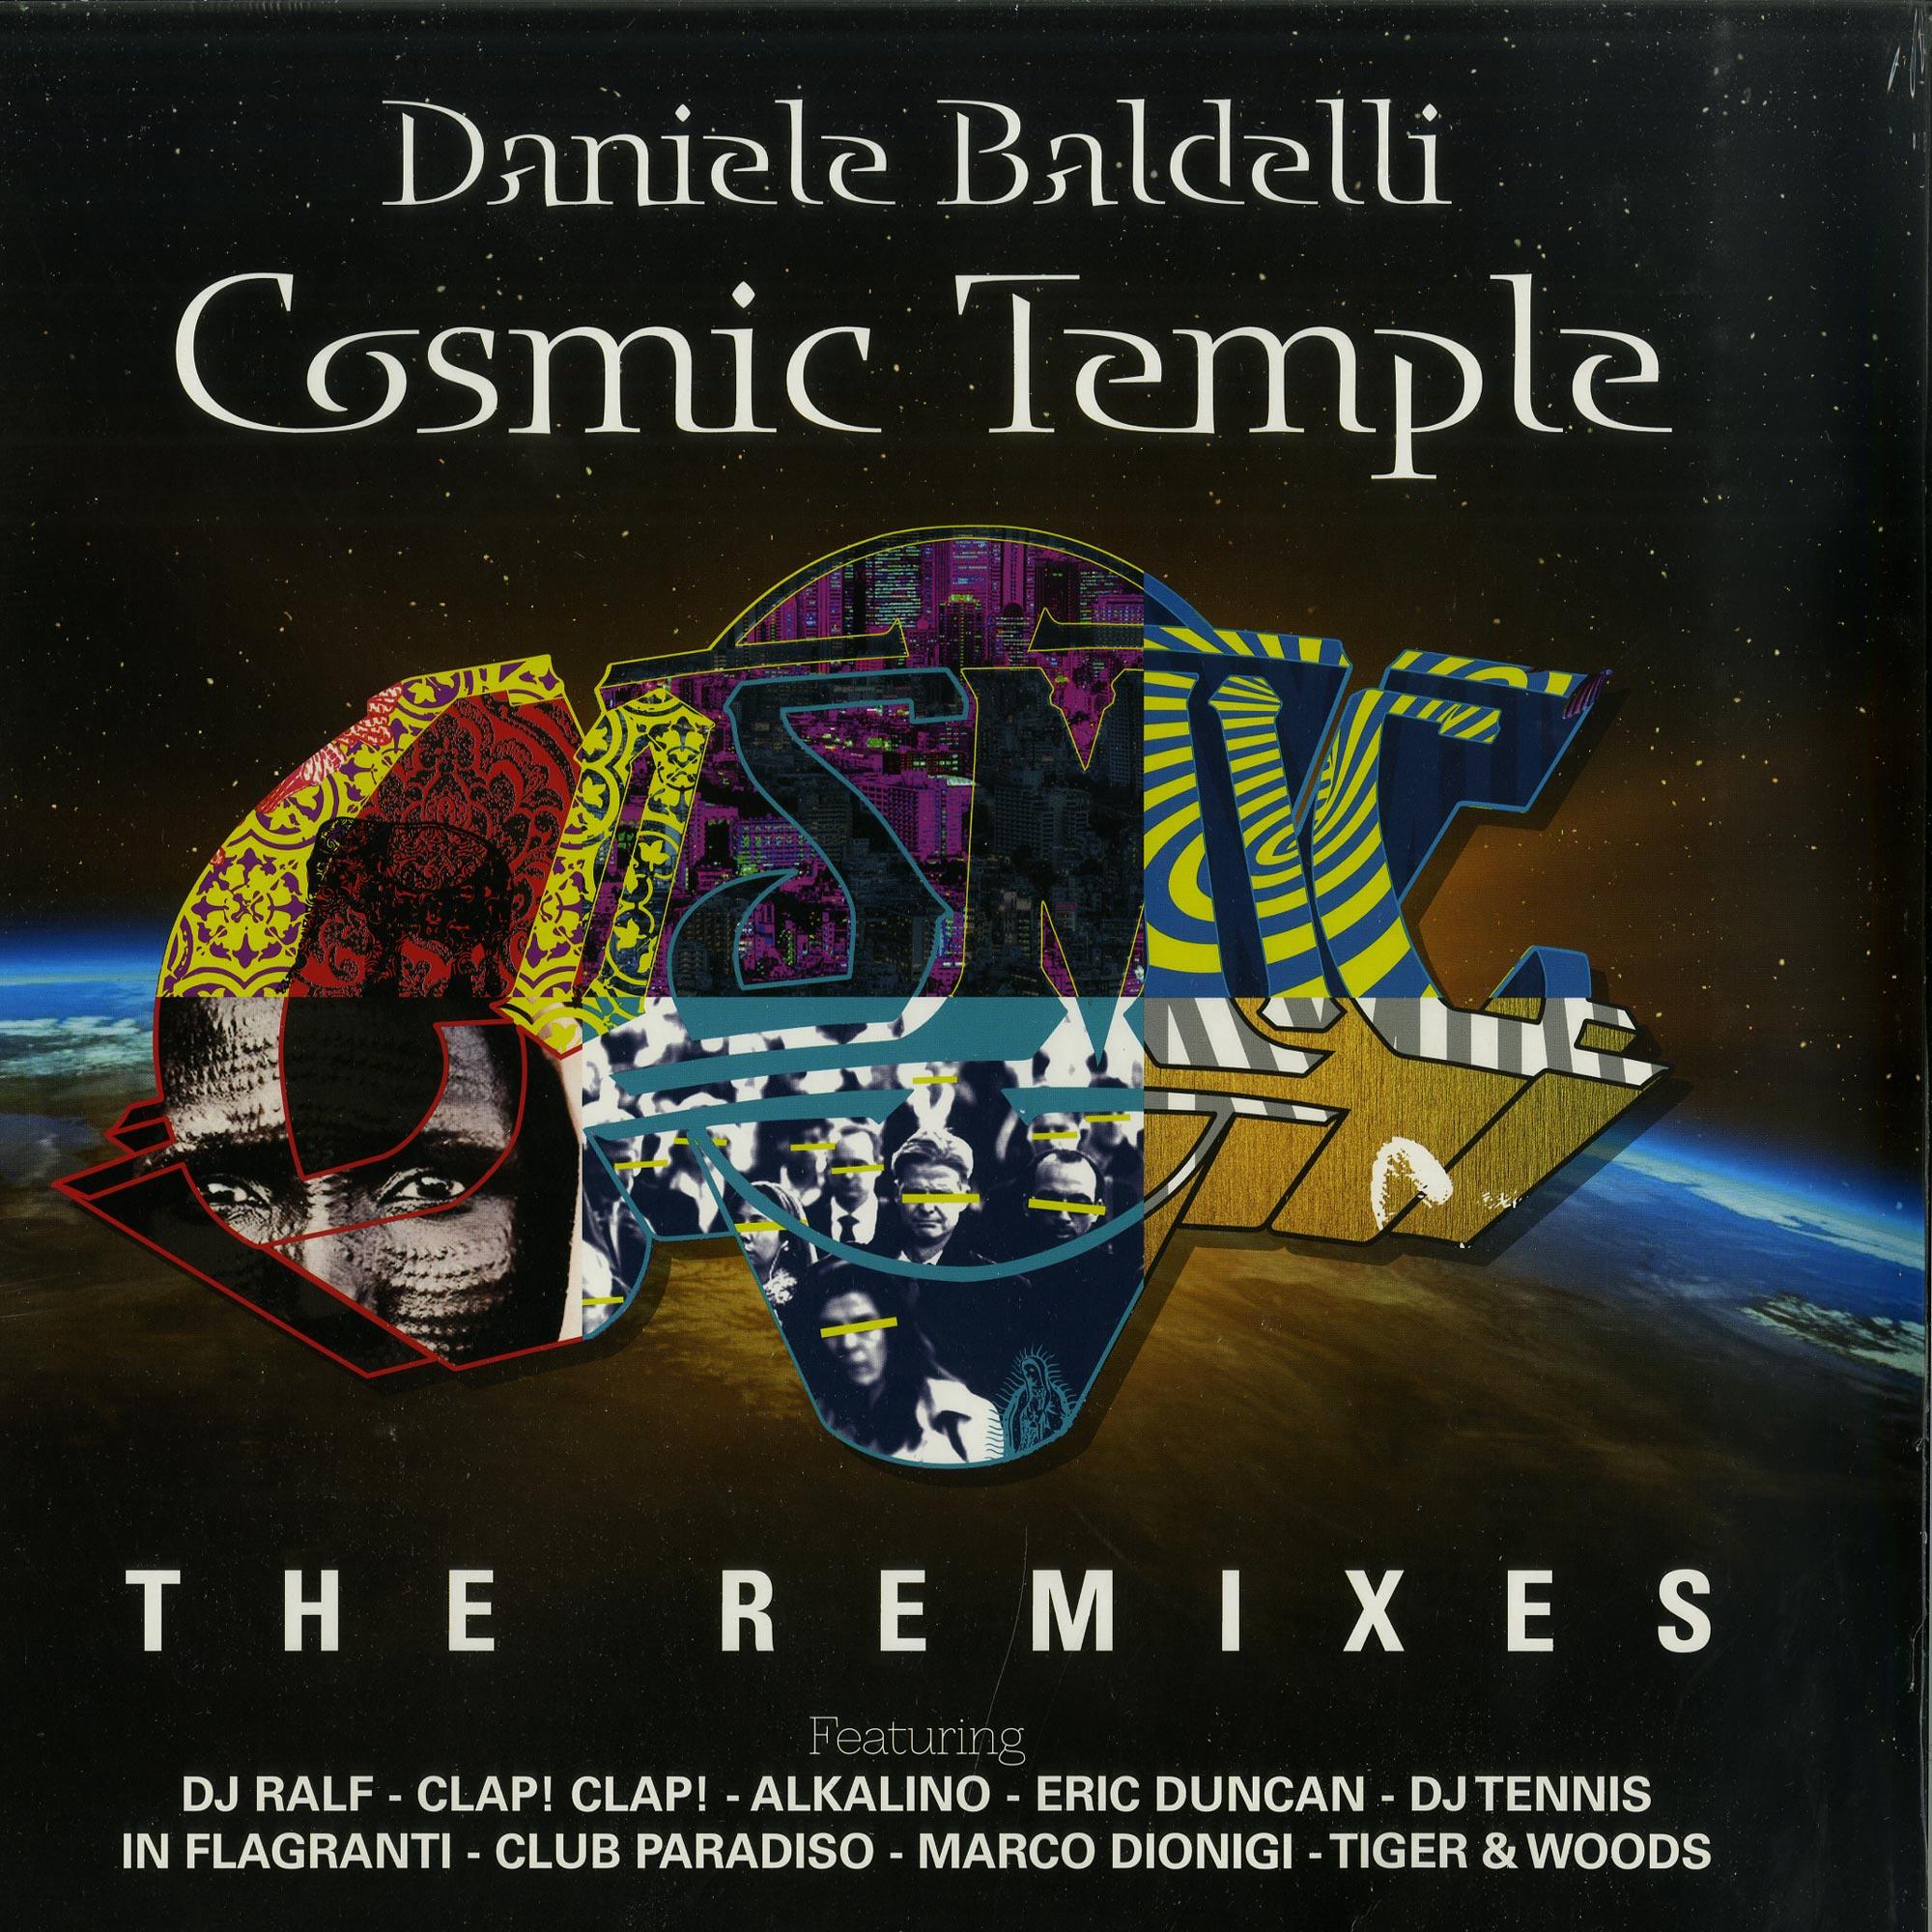 Daniele Baldelli - COSMIC TEMPLE - THE REMIXES